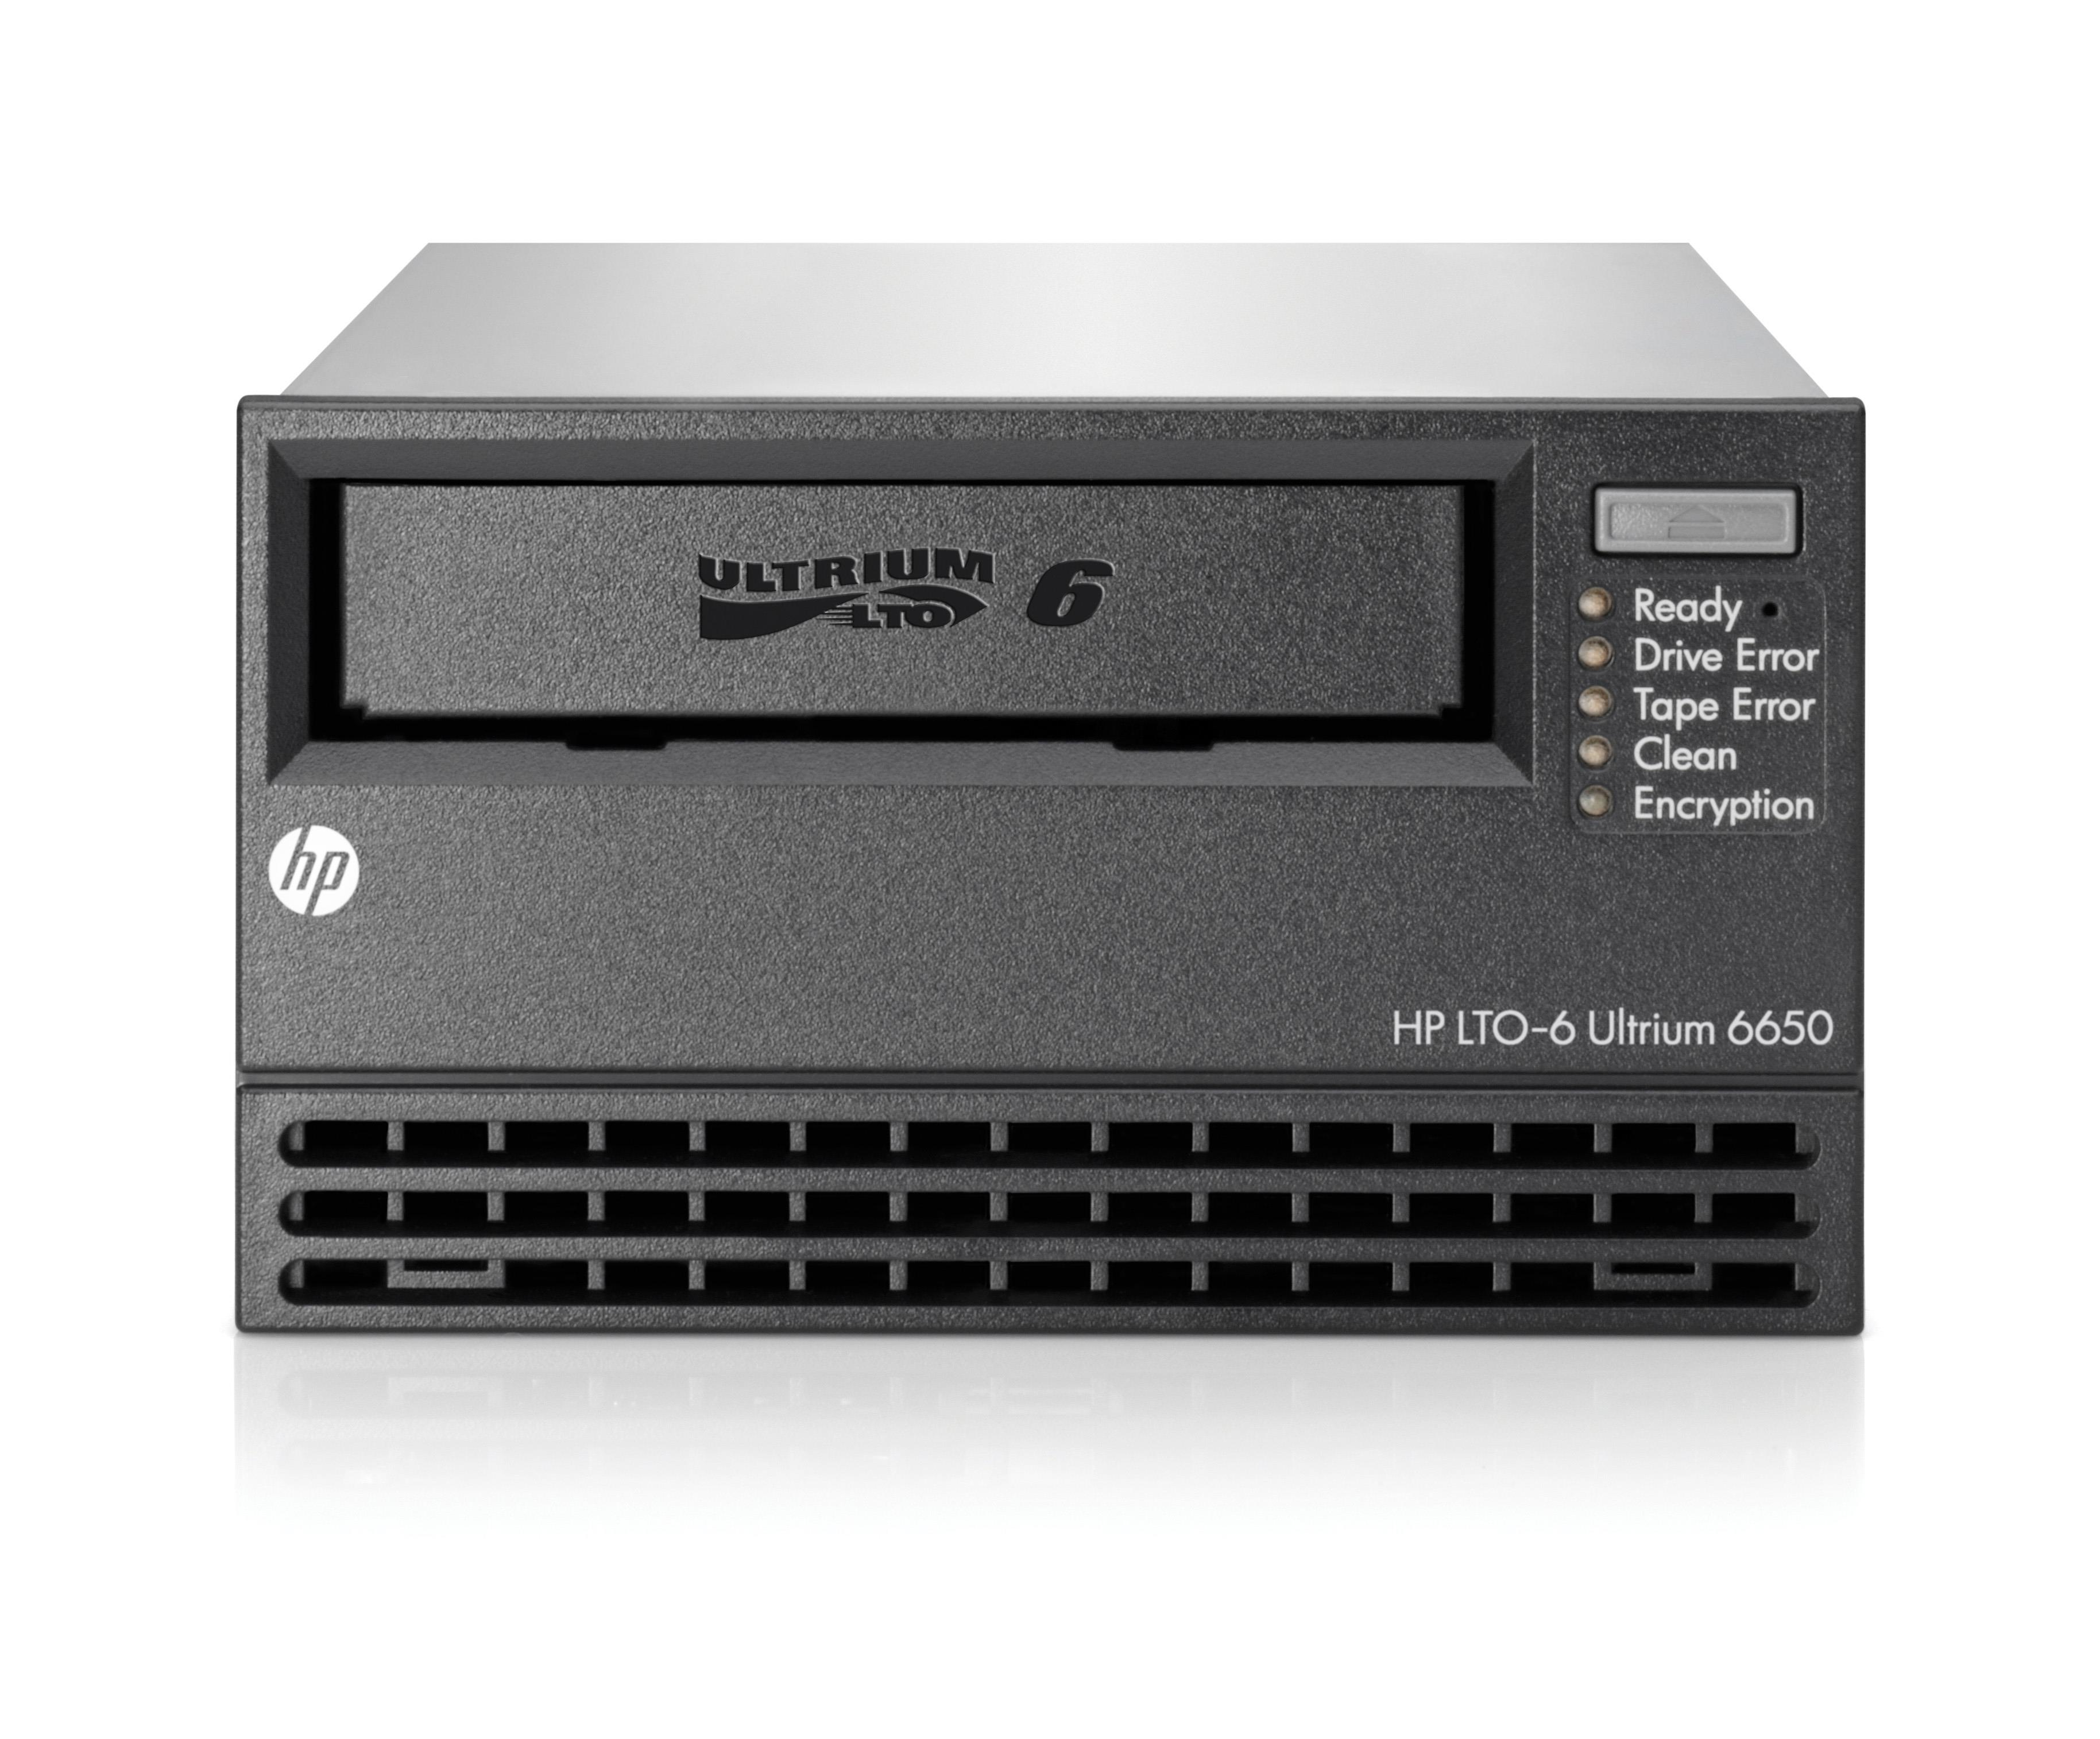 HP StoreEver LTO-6 Ultrium 6650 (6.25TB) Tape Drive SAS 5.25 inch Full Height (External)